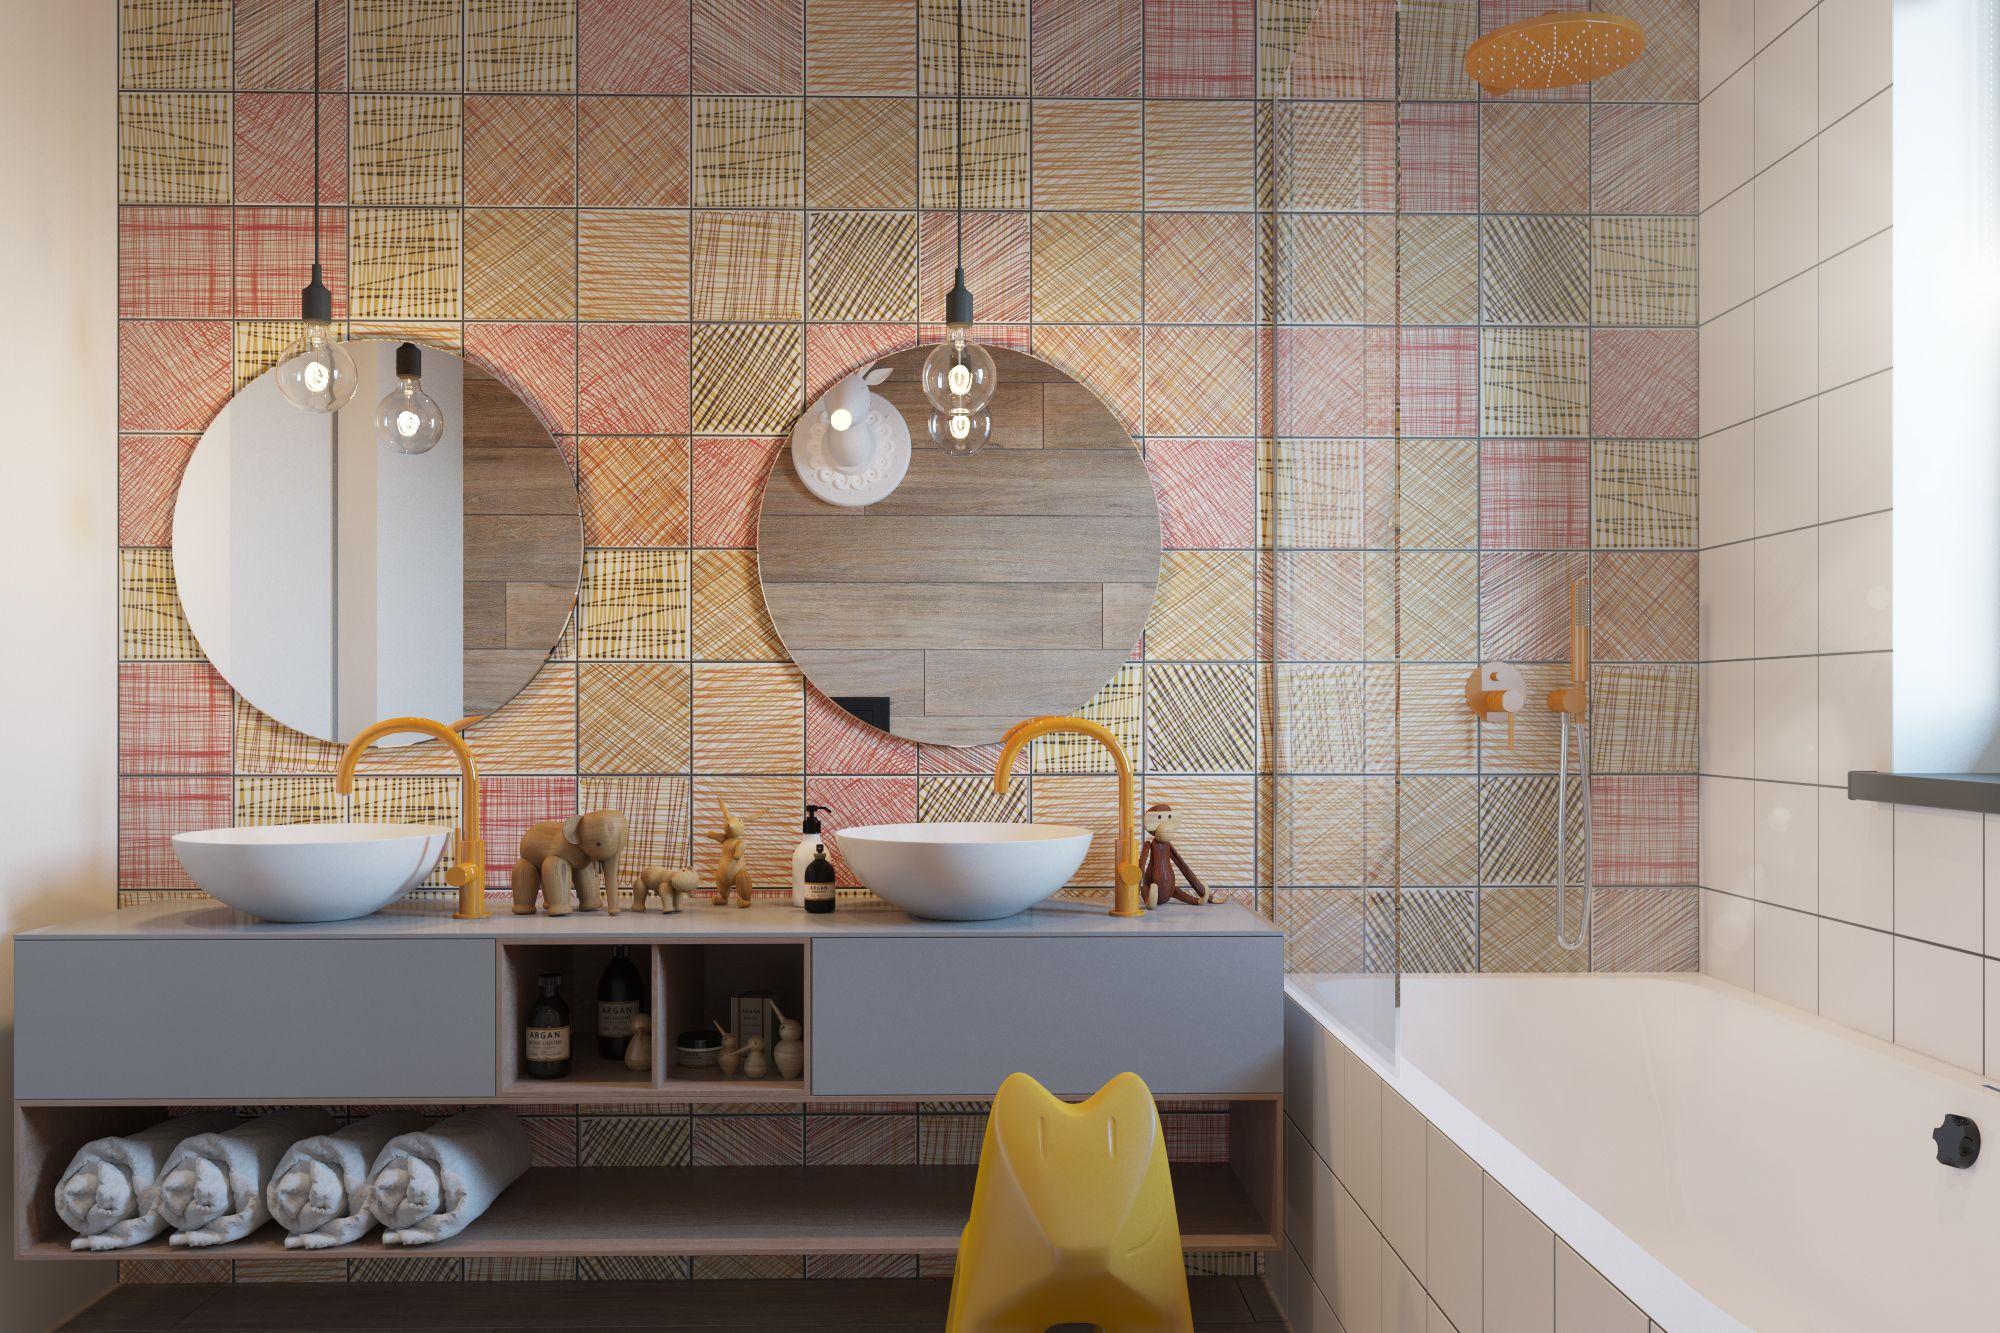 - Colour scheme - Tiles - Sink - Lighting